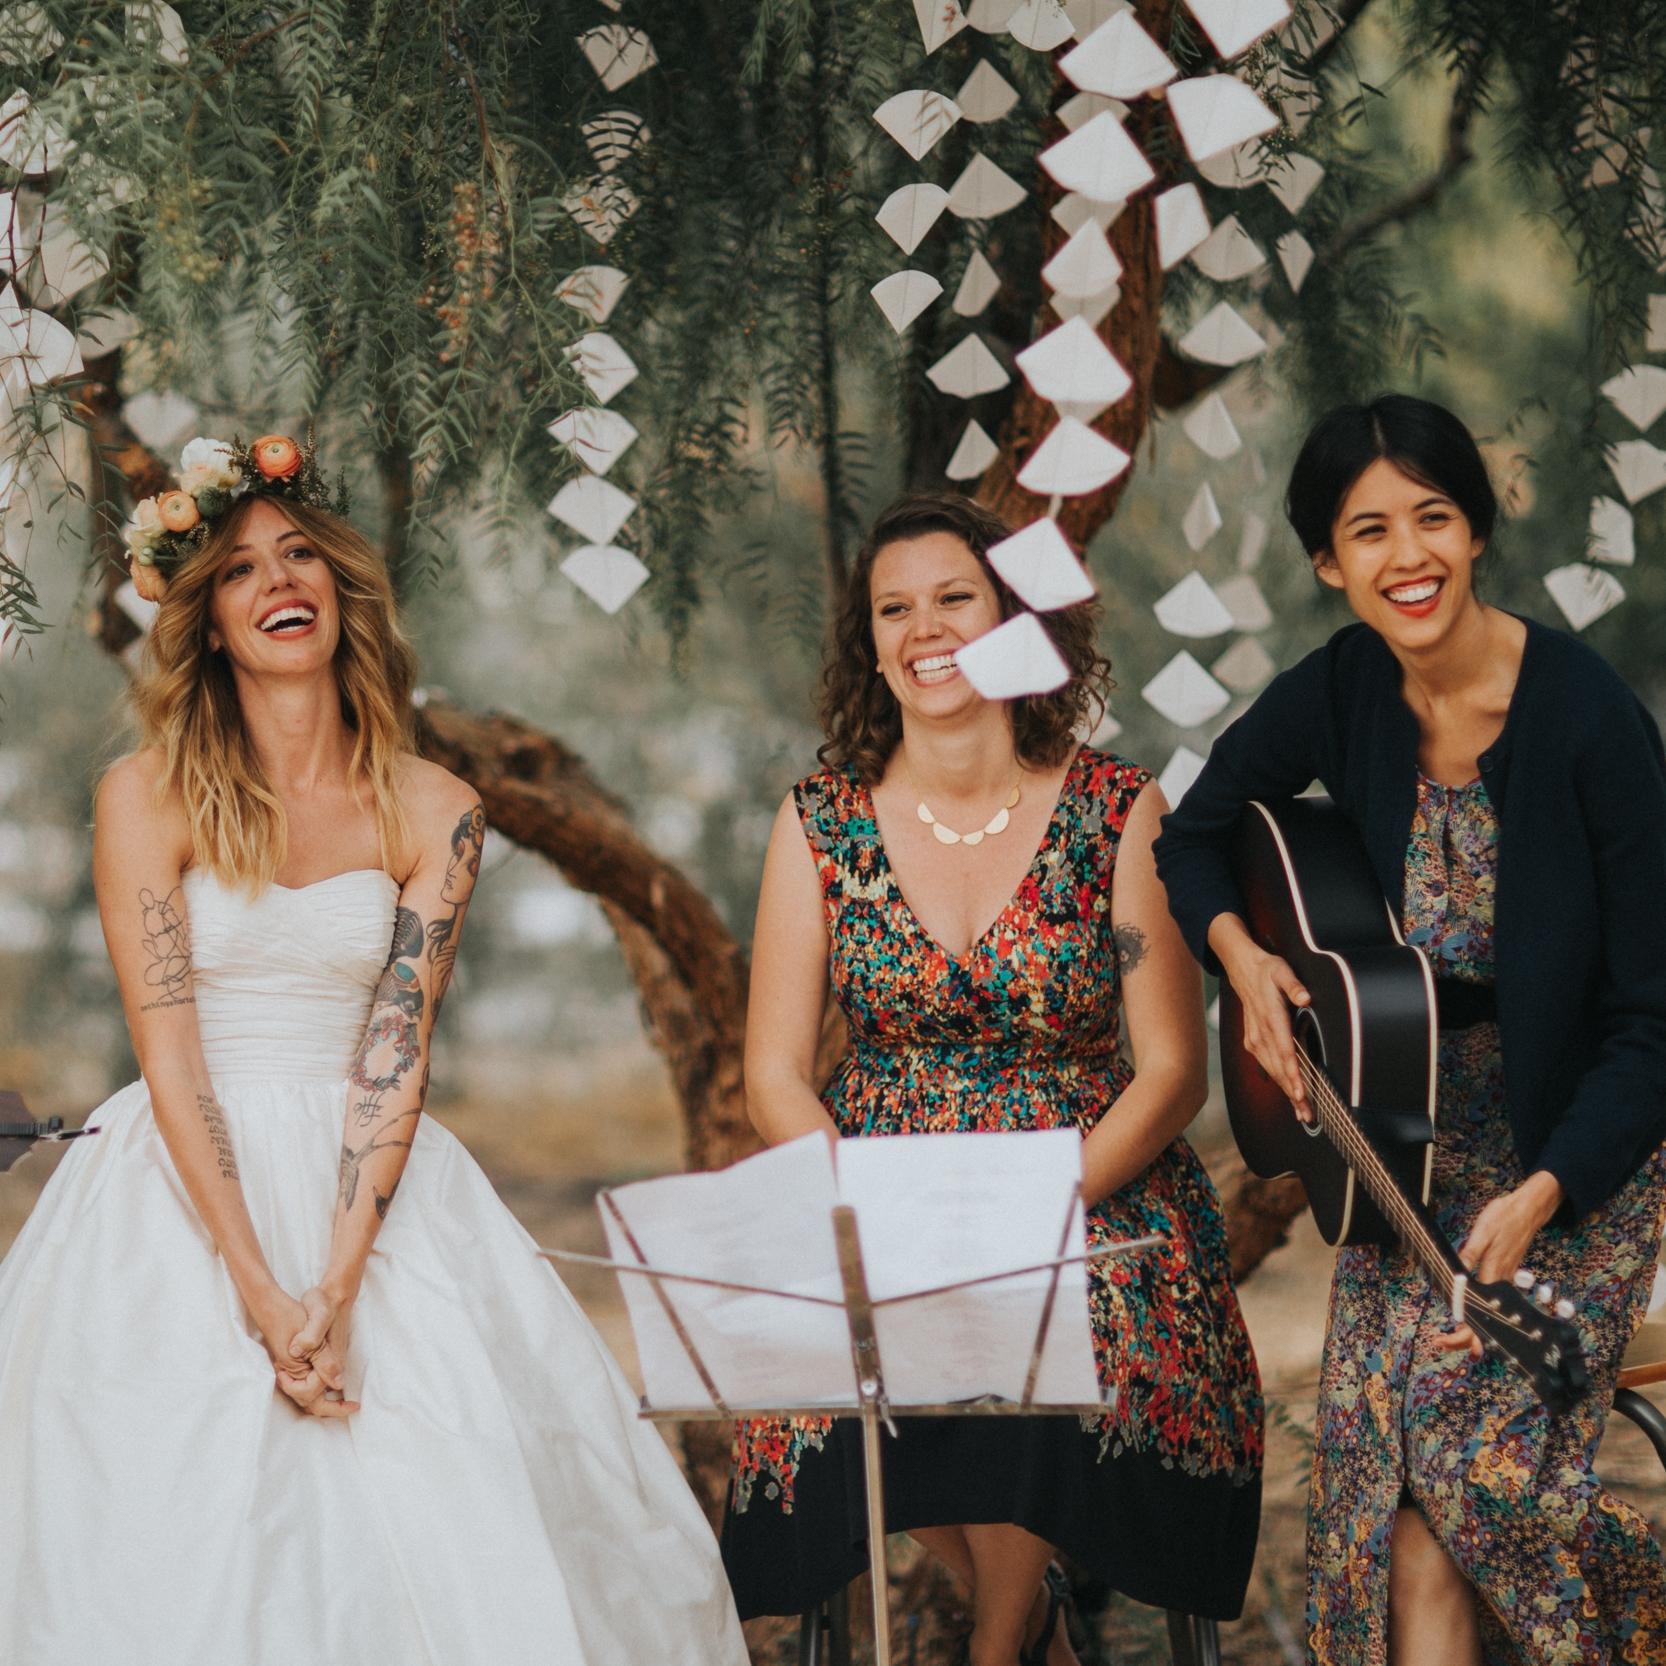 walnut-creek-ranch-ojai-kindred-wedding-photography-144.jpg